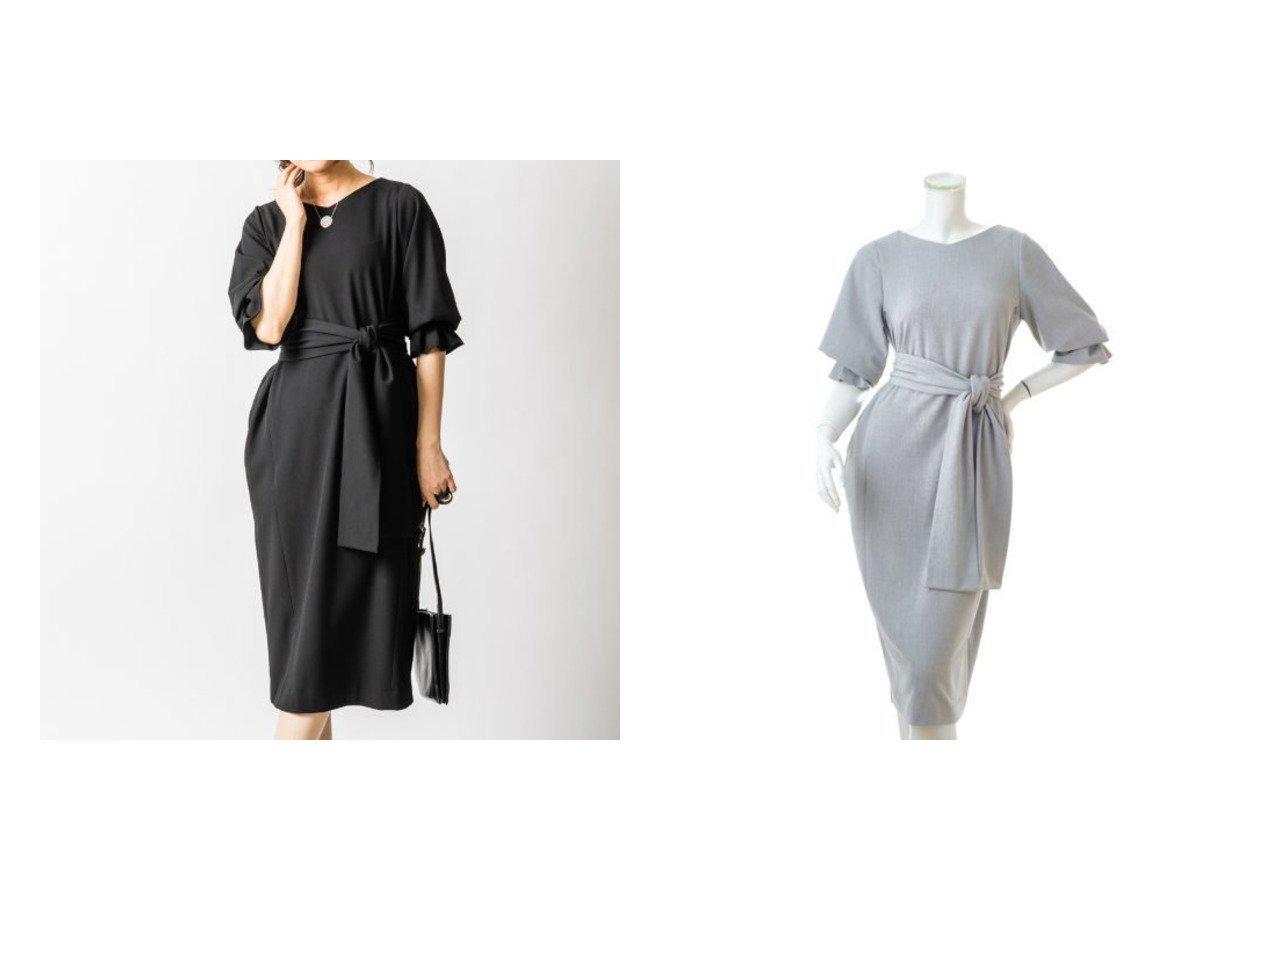 【VIRINA/ヴィリーナ】のアイシャナーシングドレス ワンピース・ドレスのおすすめ!人気、トレンド・レディースファッションの通販    レディースファッション・服の通販 founy(ファニー)